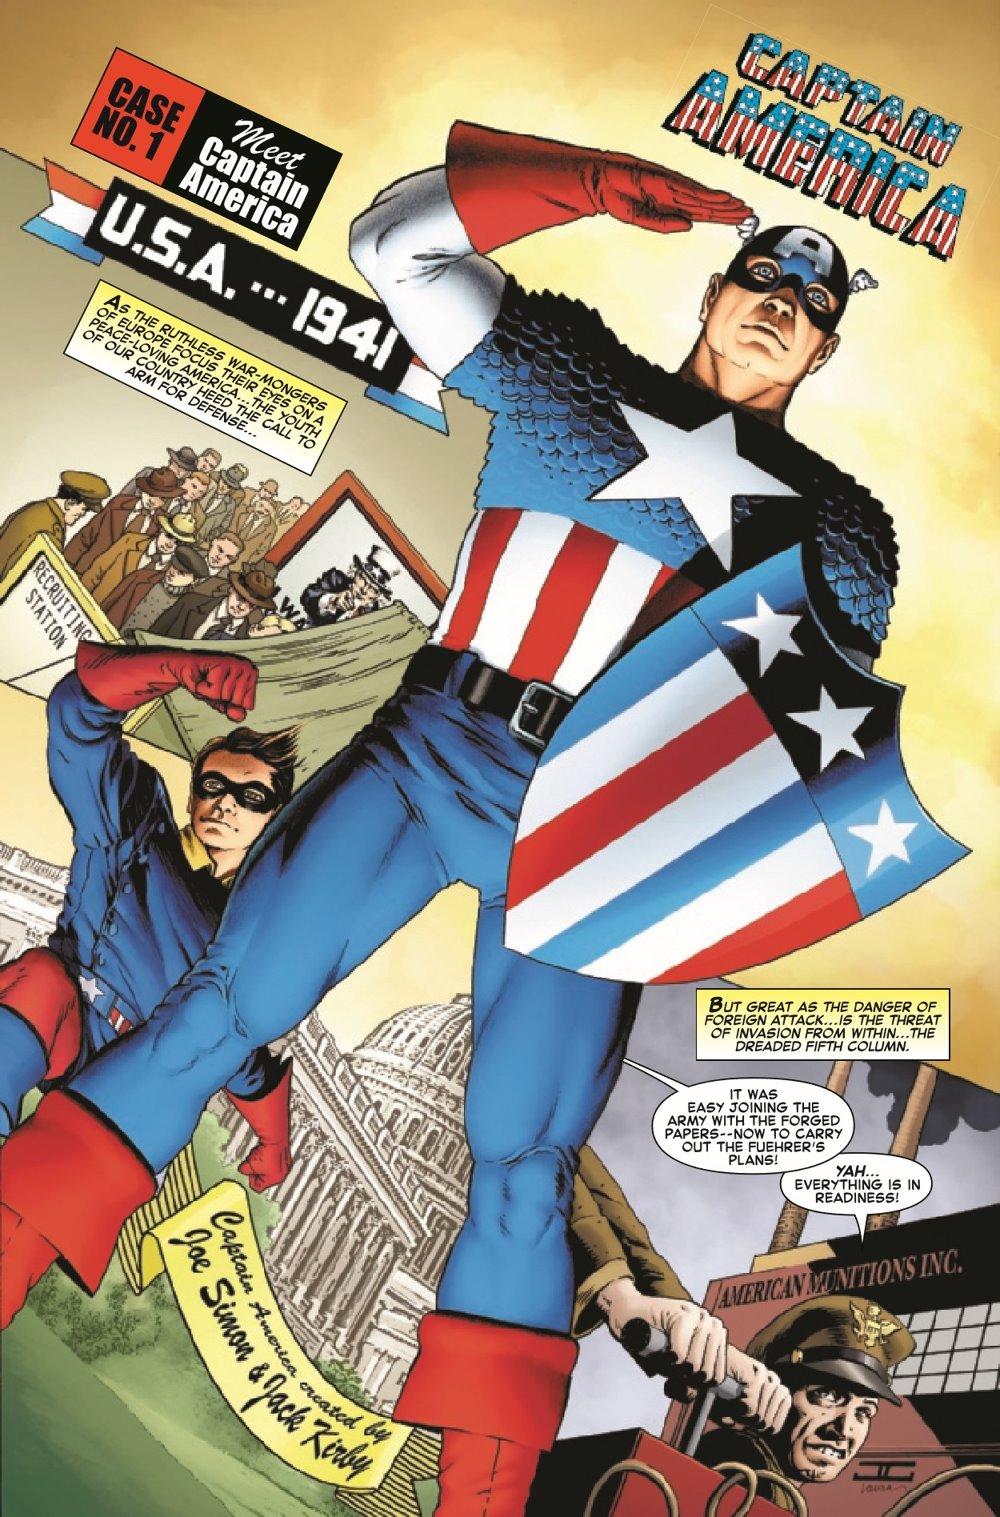 CAPAANNIVERSARY2021001_Preview-2 ComicList Previews: CAPTAIN AMERICA ANNIVERSARY TRIBUTE #1